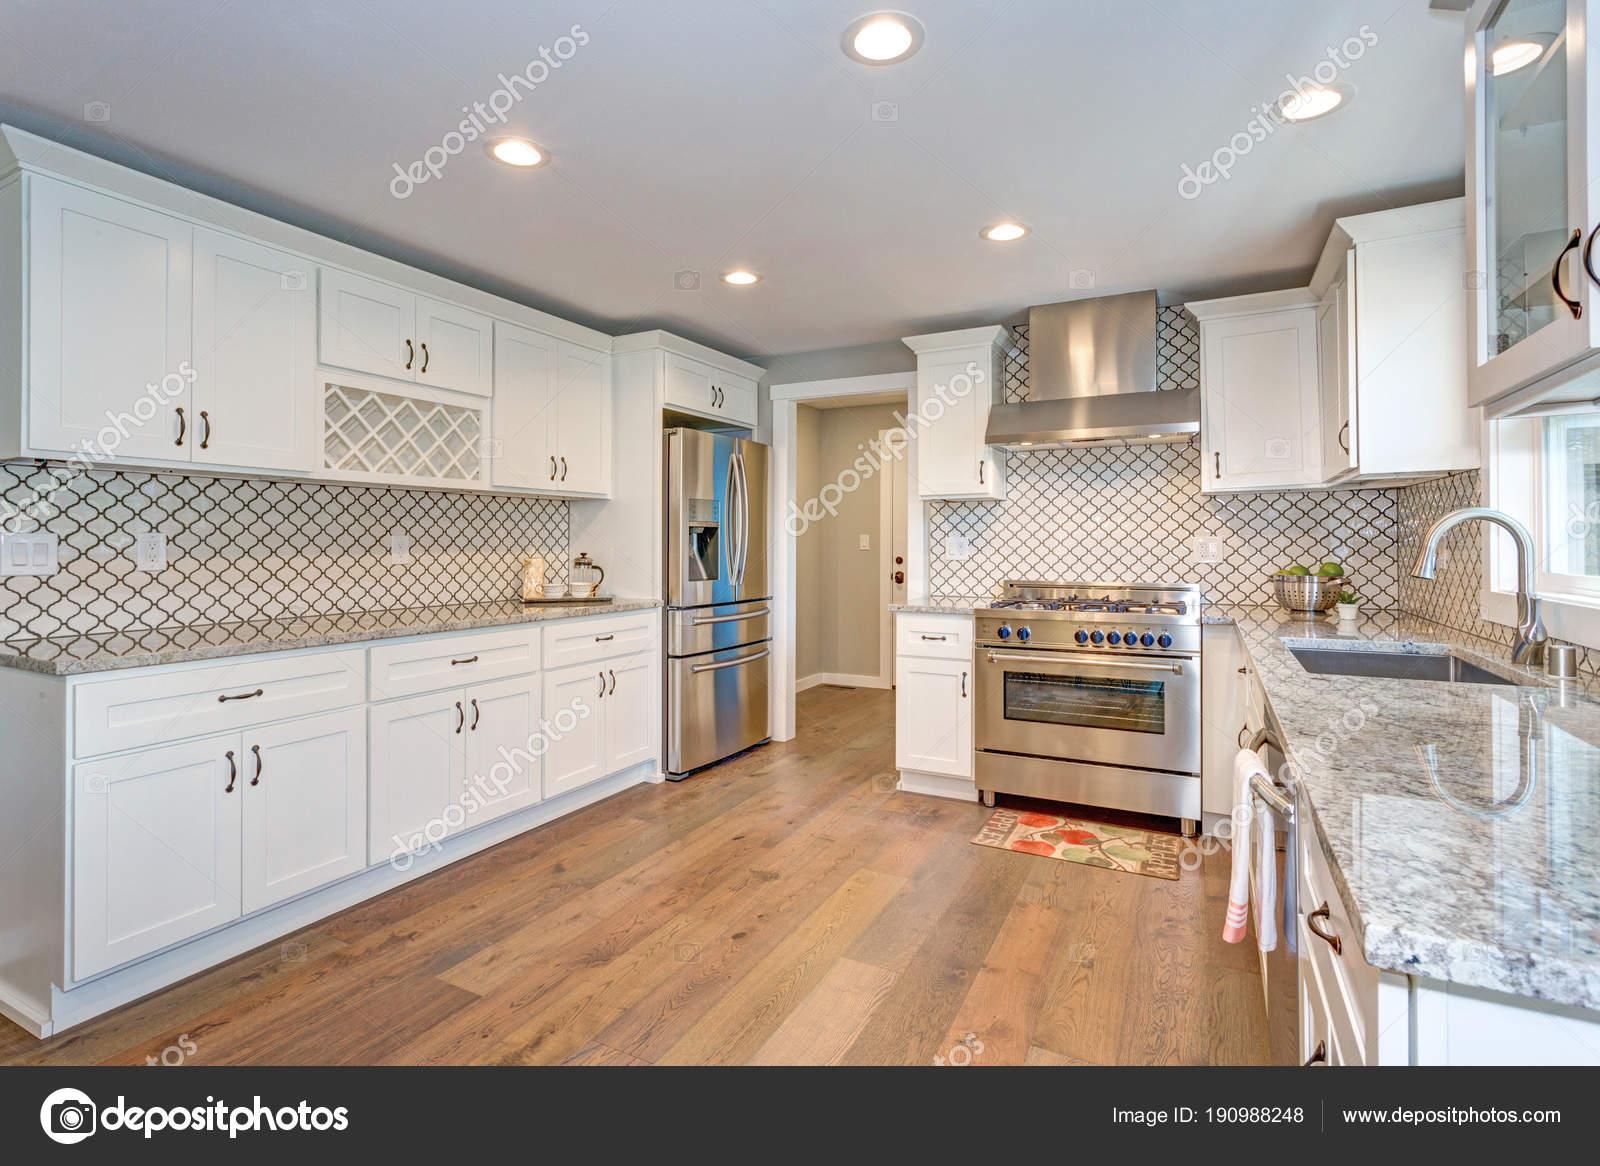 Splendida cucina bianca con marocchino piastrelle backsplash